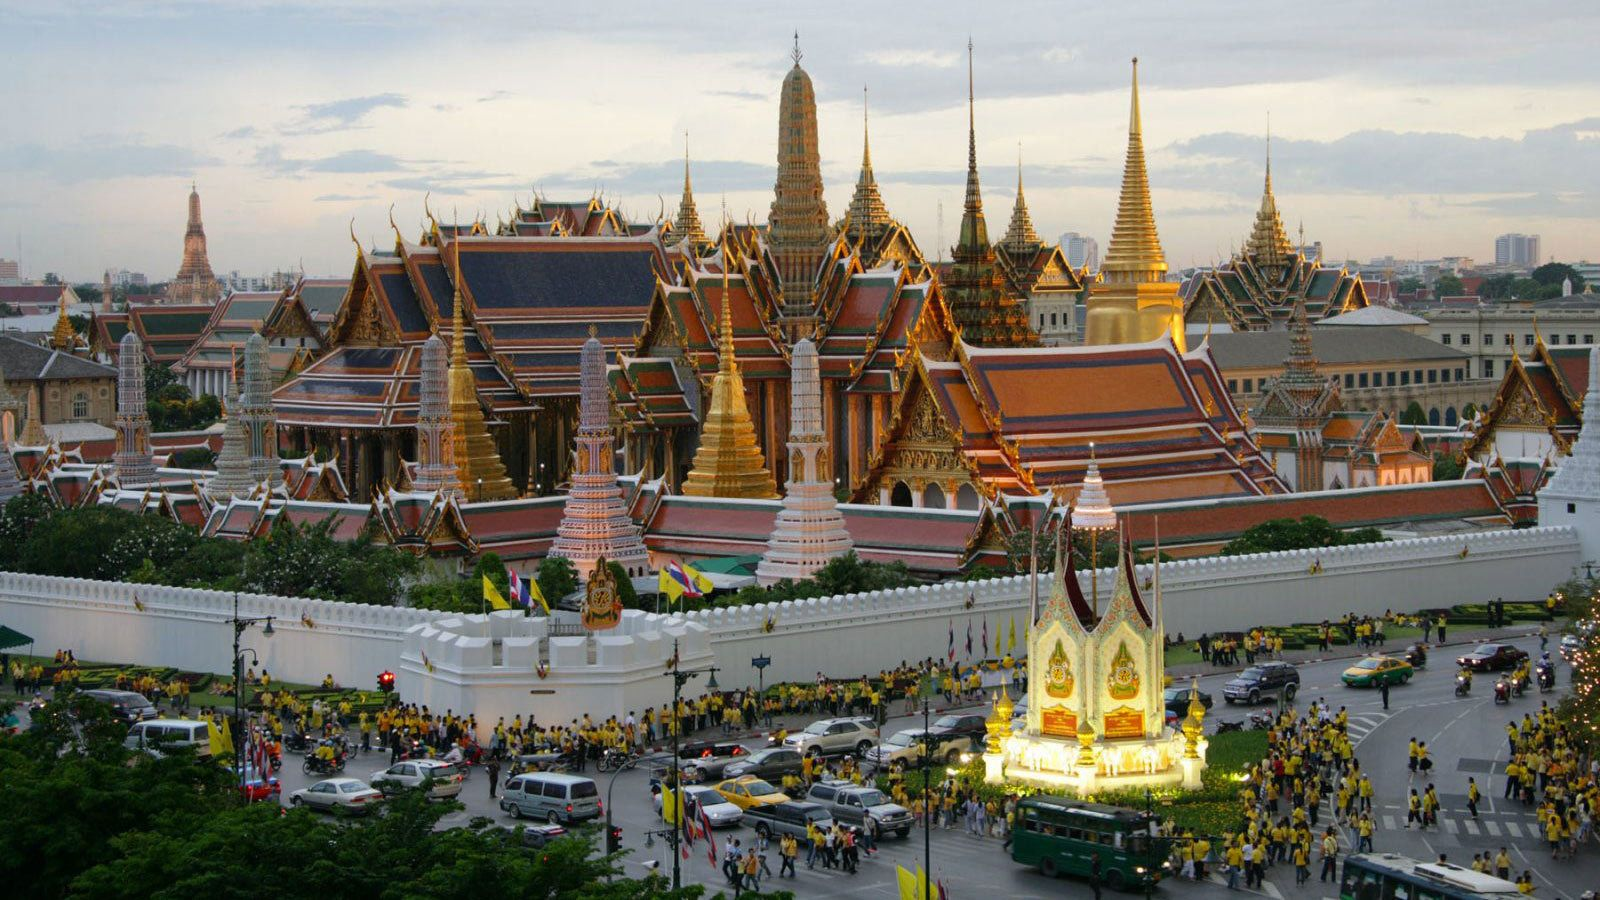 Stunning view of the Grand Palace in Bangkok